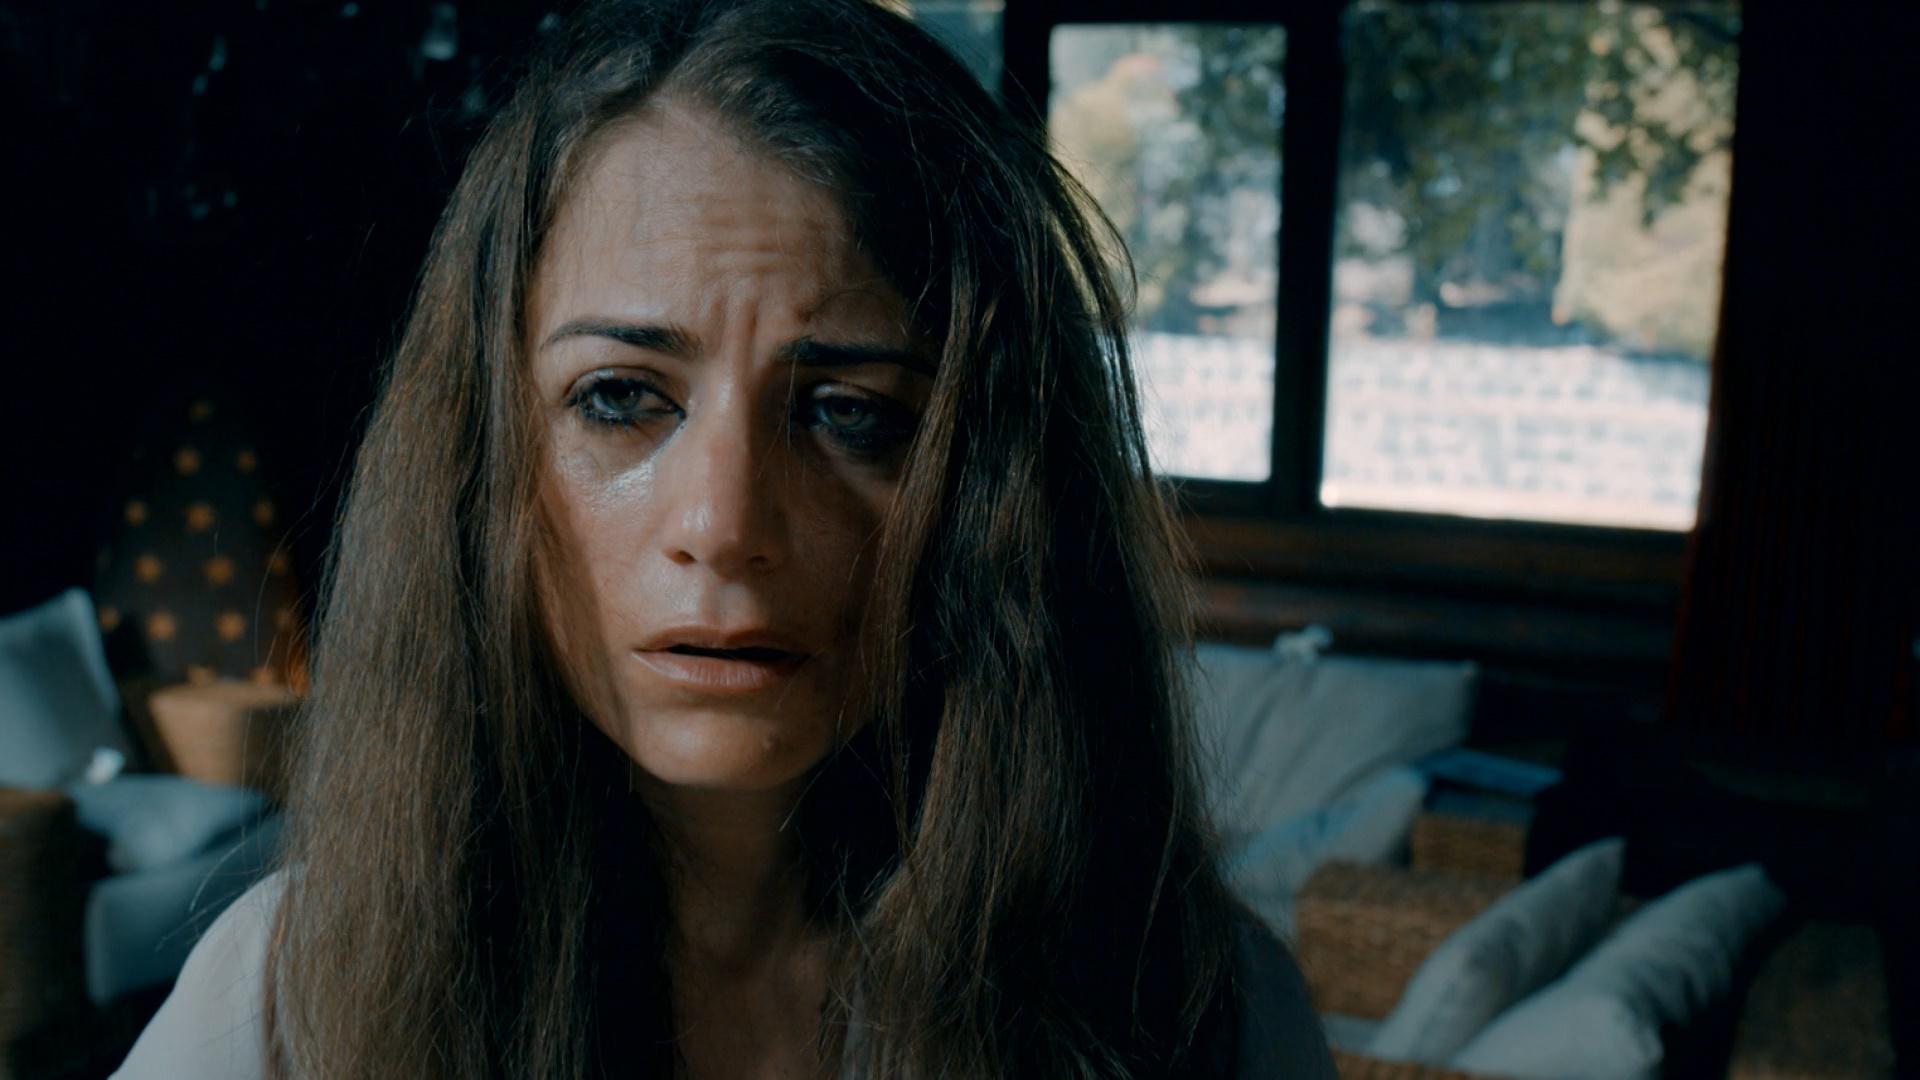 Kızım Gibi Kokuyorsun | 2020 | Yerli Film | WEB-DL | XviD | Sansürsüz | m720p - m1080p | WEB-DL | Tek Link